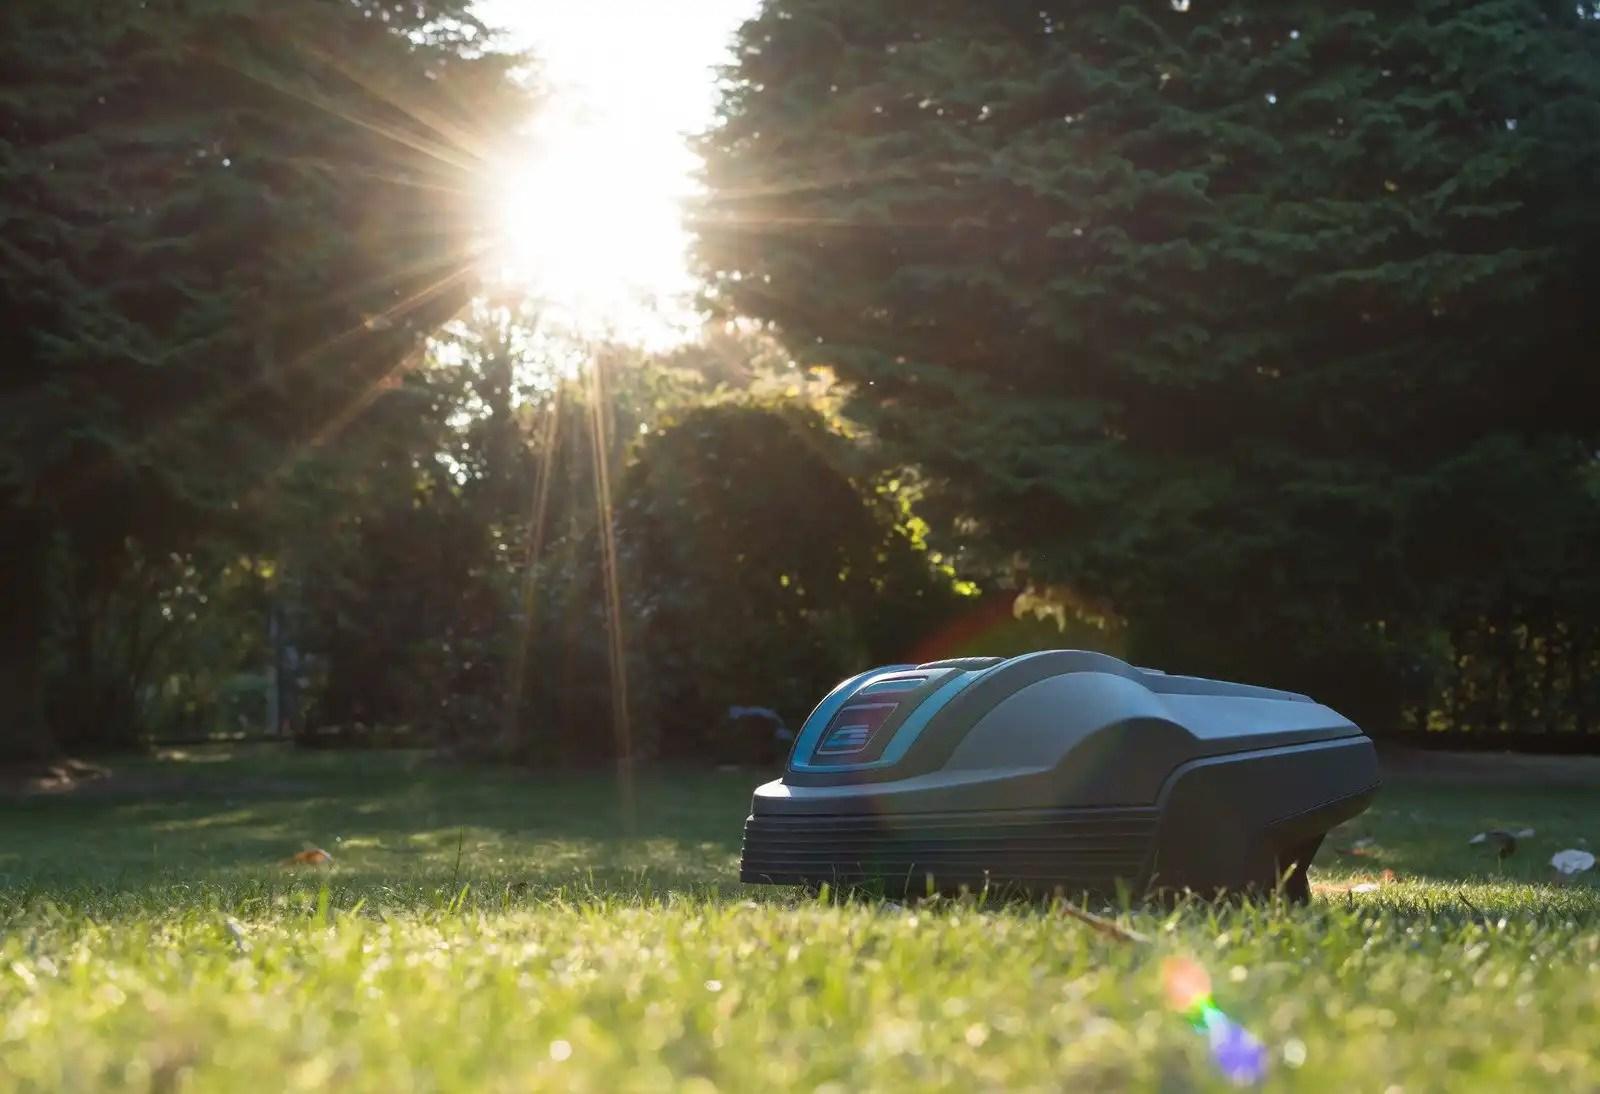 robot lawn mower cutting grass in back yard